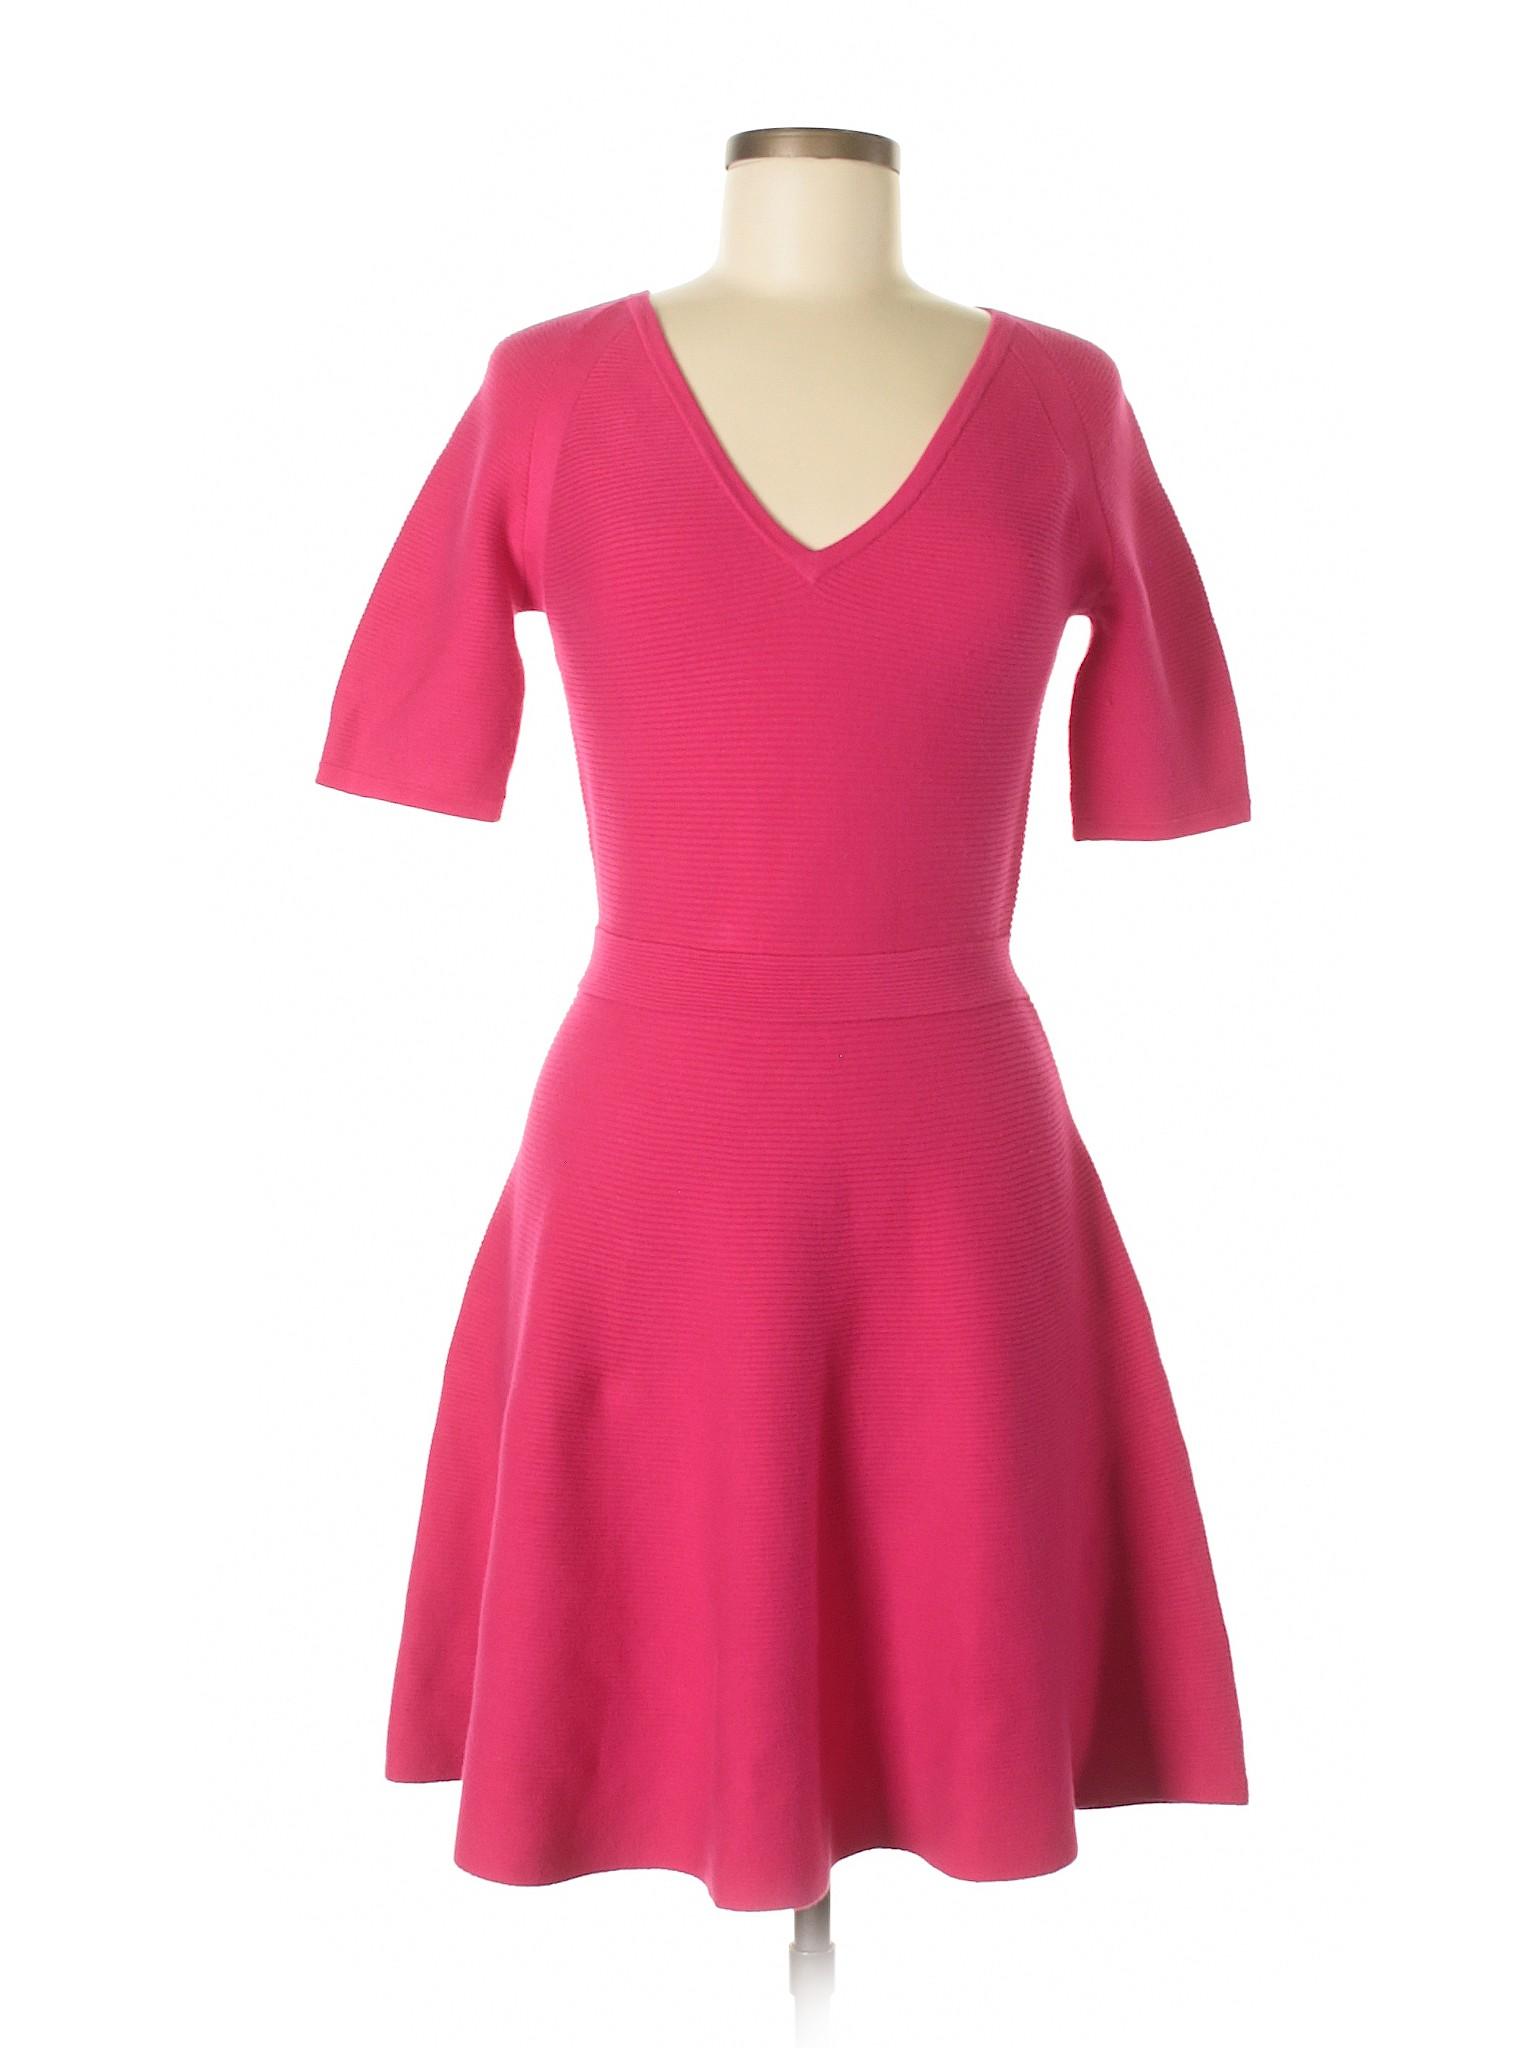 Turk Casual Turk Selling Dress Casual Selling Trina Selling Trina Trina Selling Dress Dress Trina Casual Turk FxA8wxE